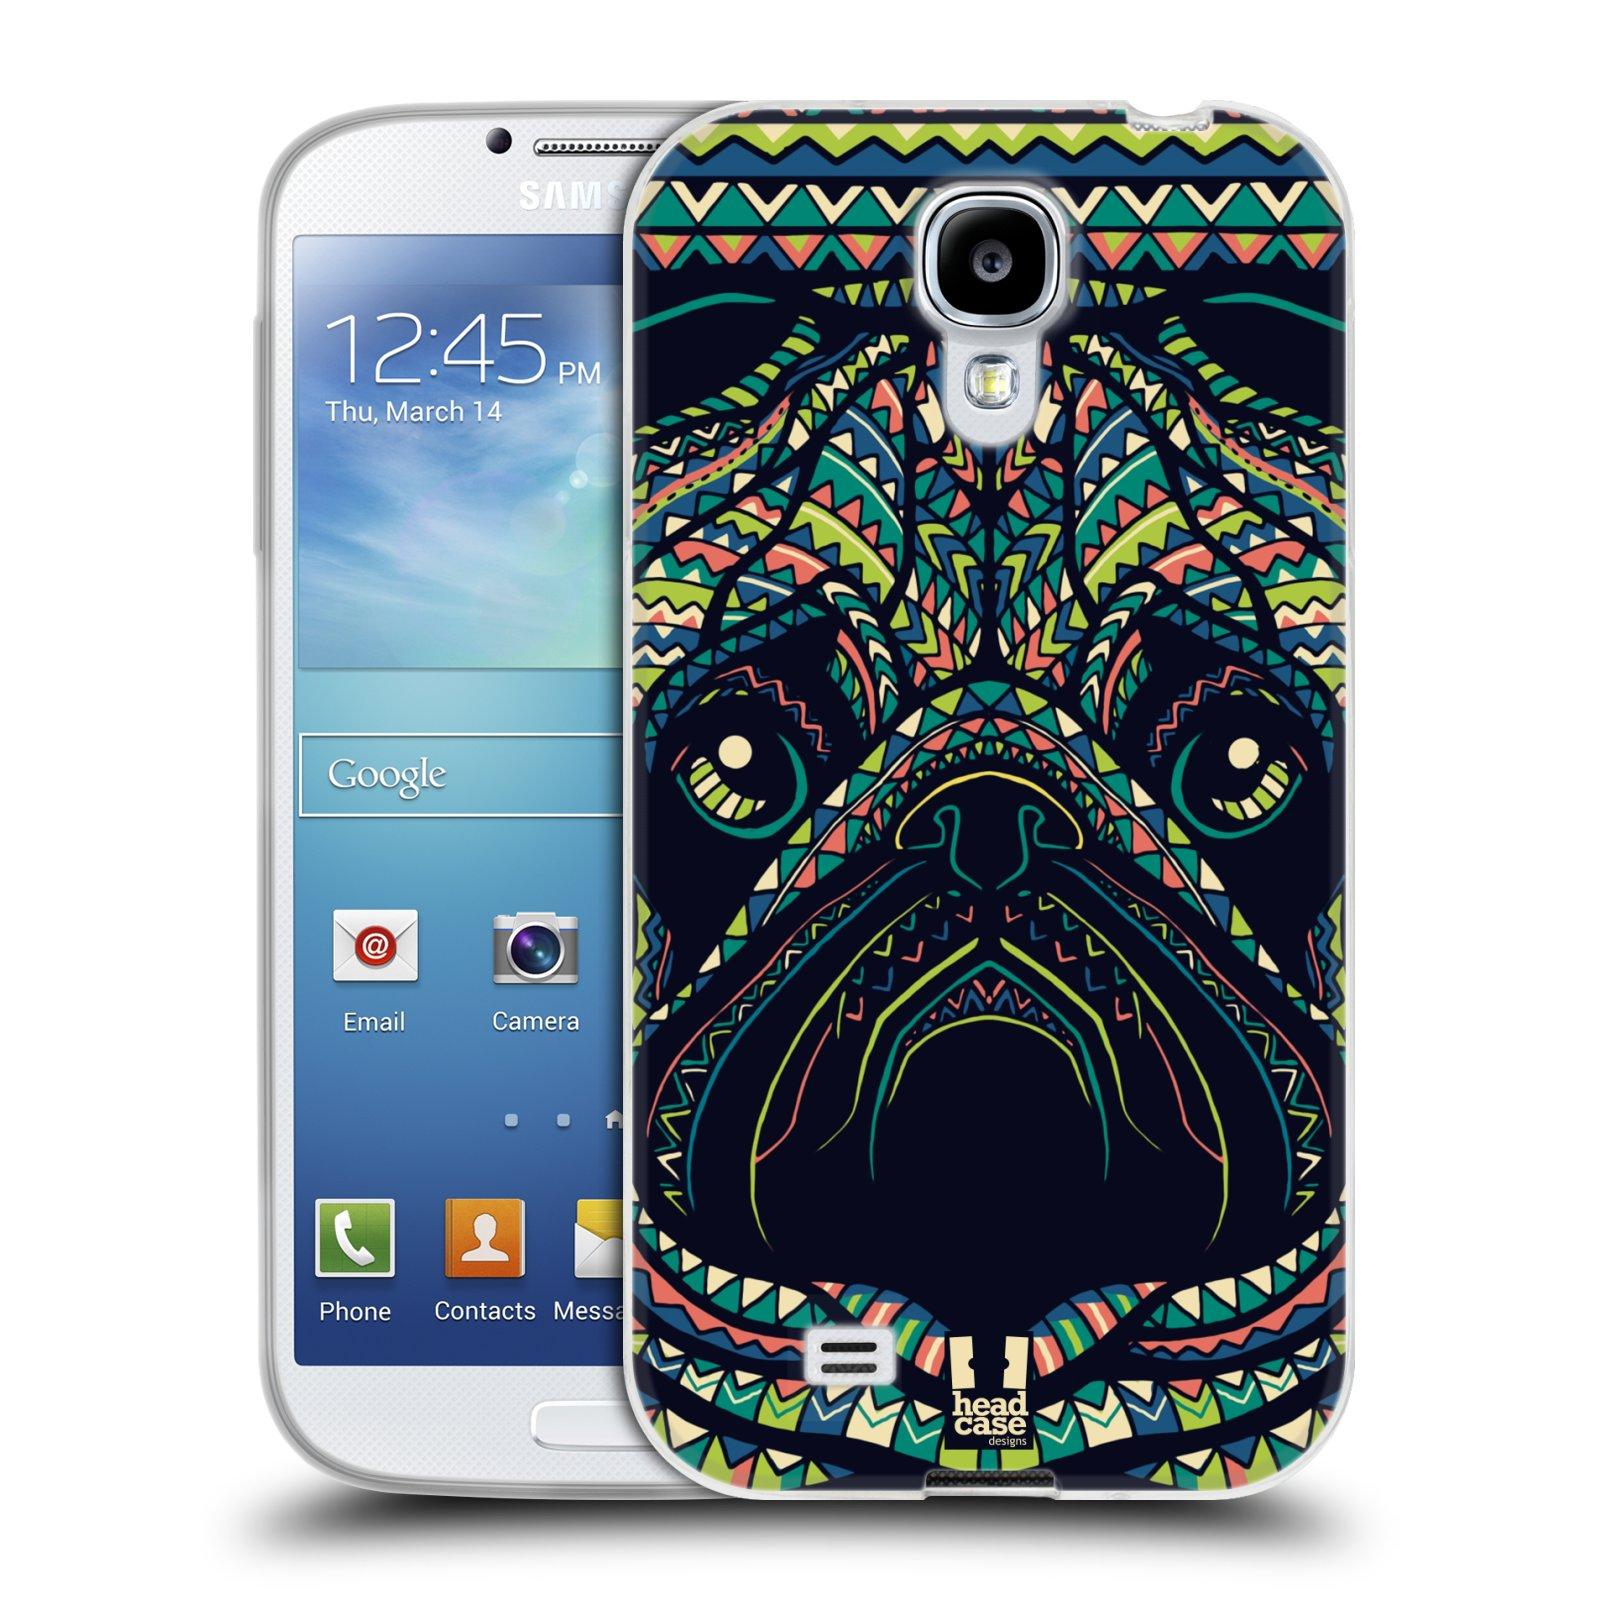 HEAD CASE silikonový obal na mobil Samsung Galaxy S4 i9500 vzor Aztécký motiv zvíře 3 mopsík